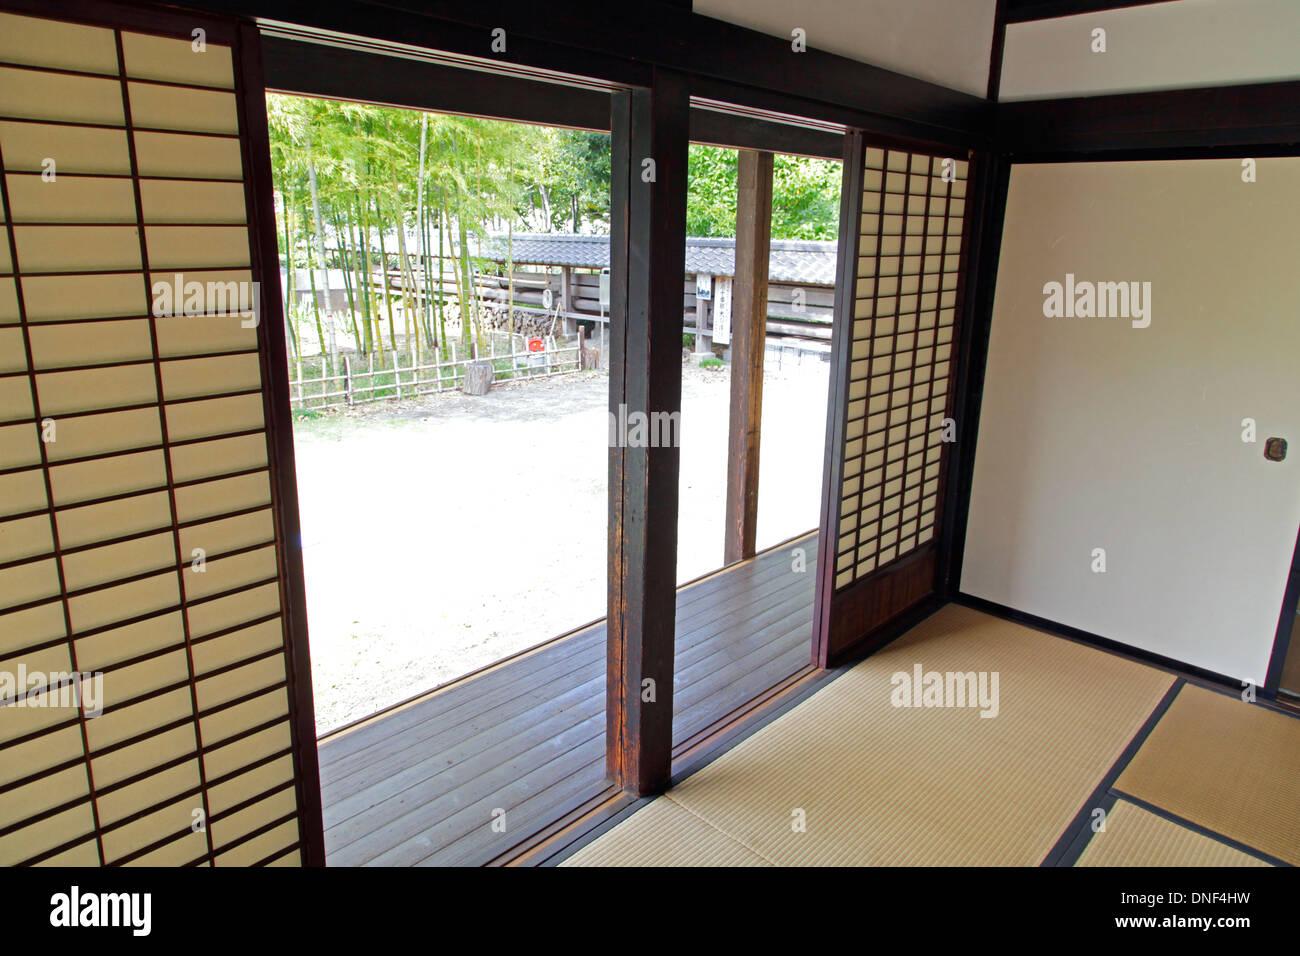 Sliding Japanese Doors Imagenes De Stock Sliding Japanese Doors - Puertas-japonesas-deslizantes